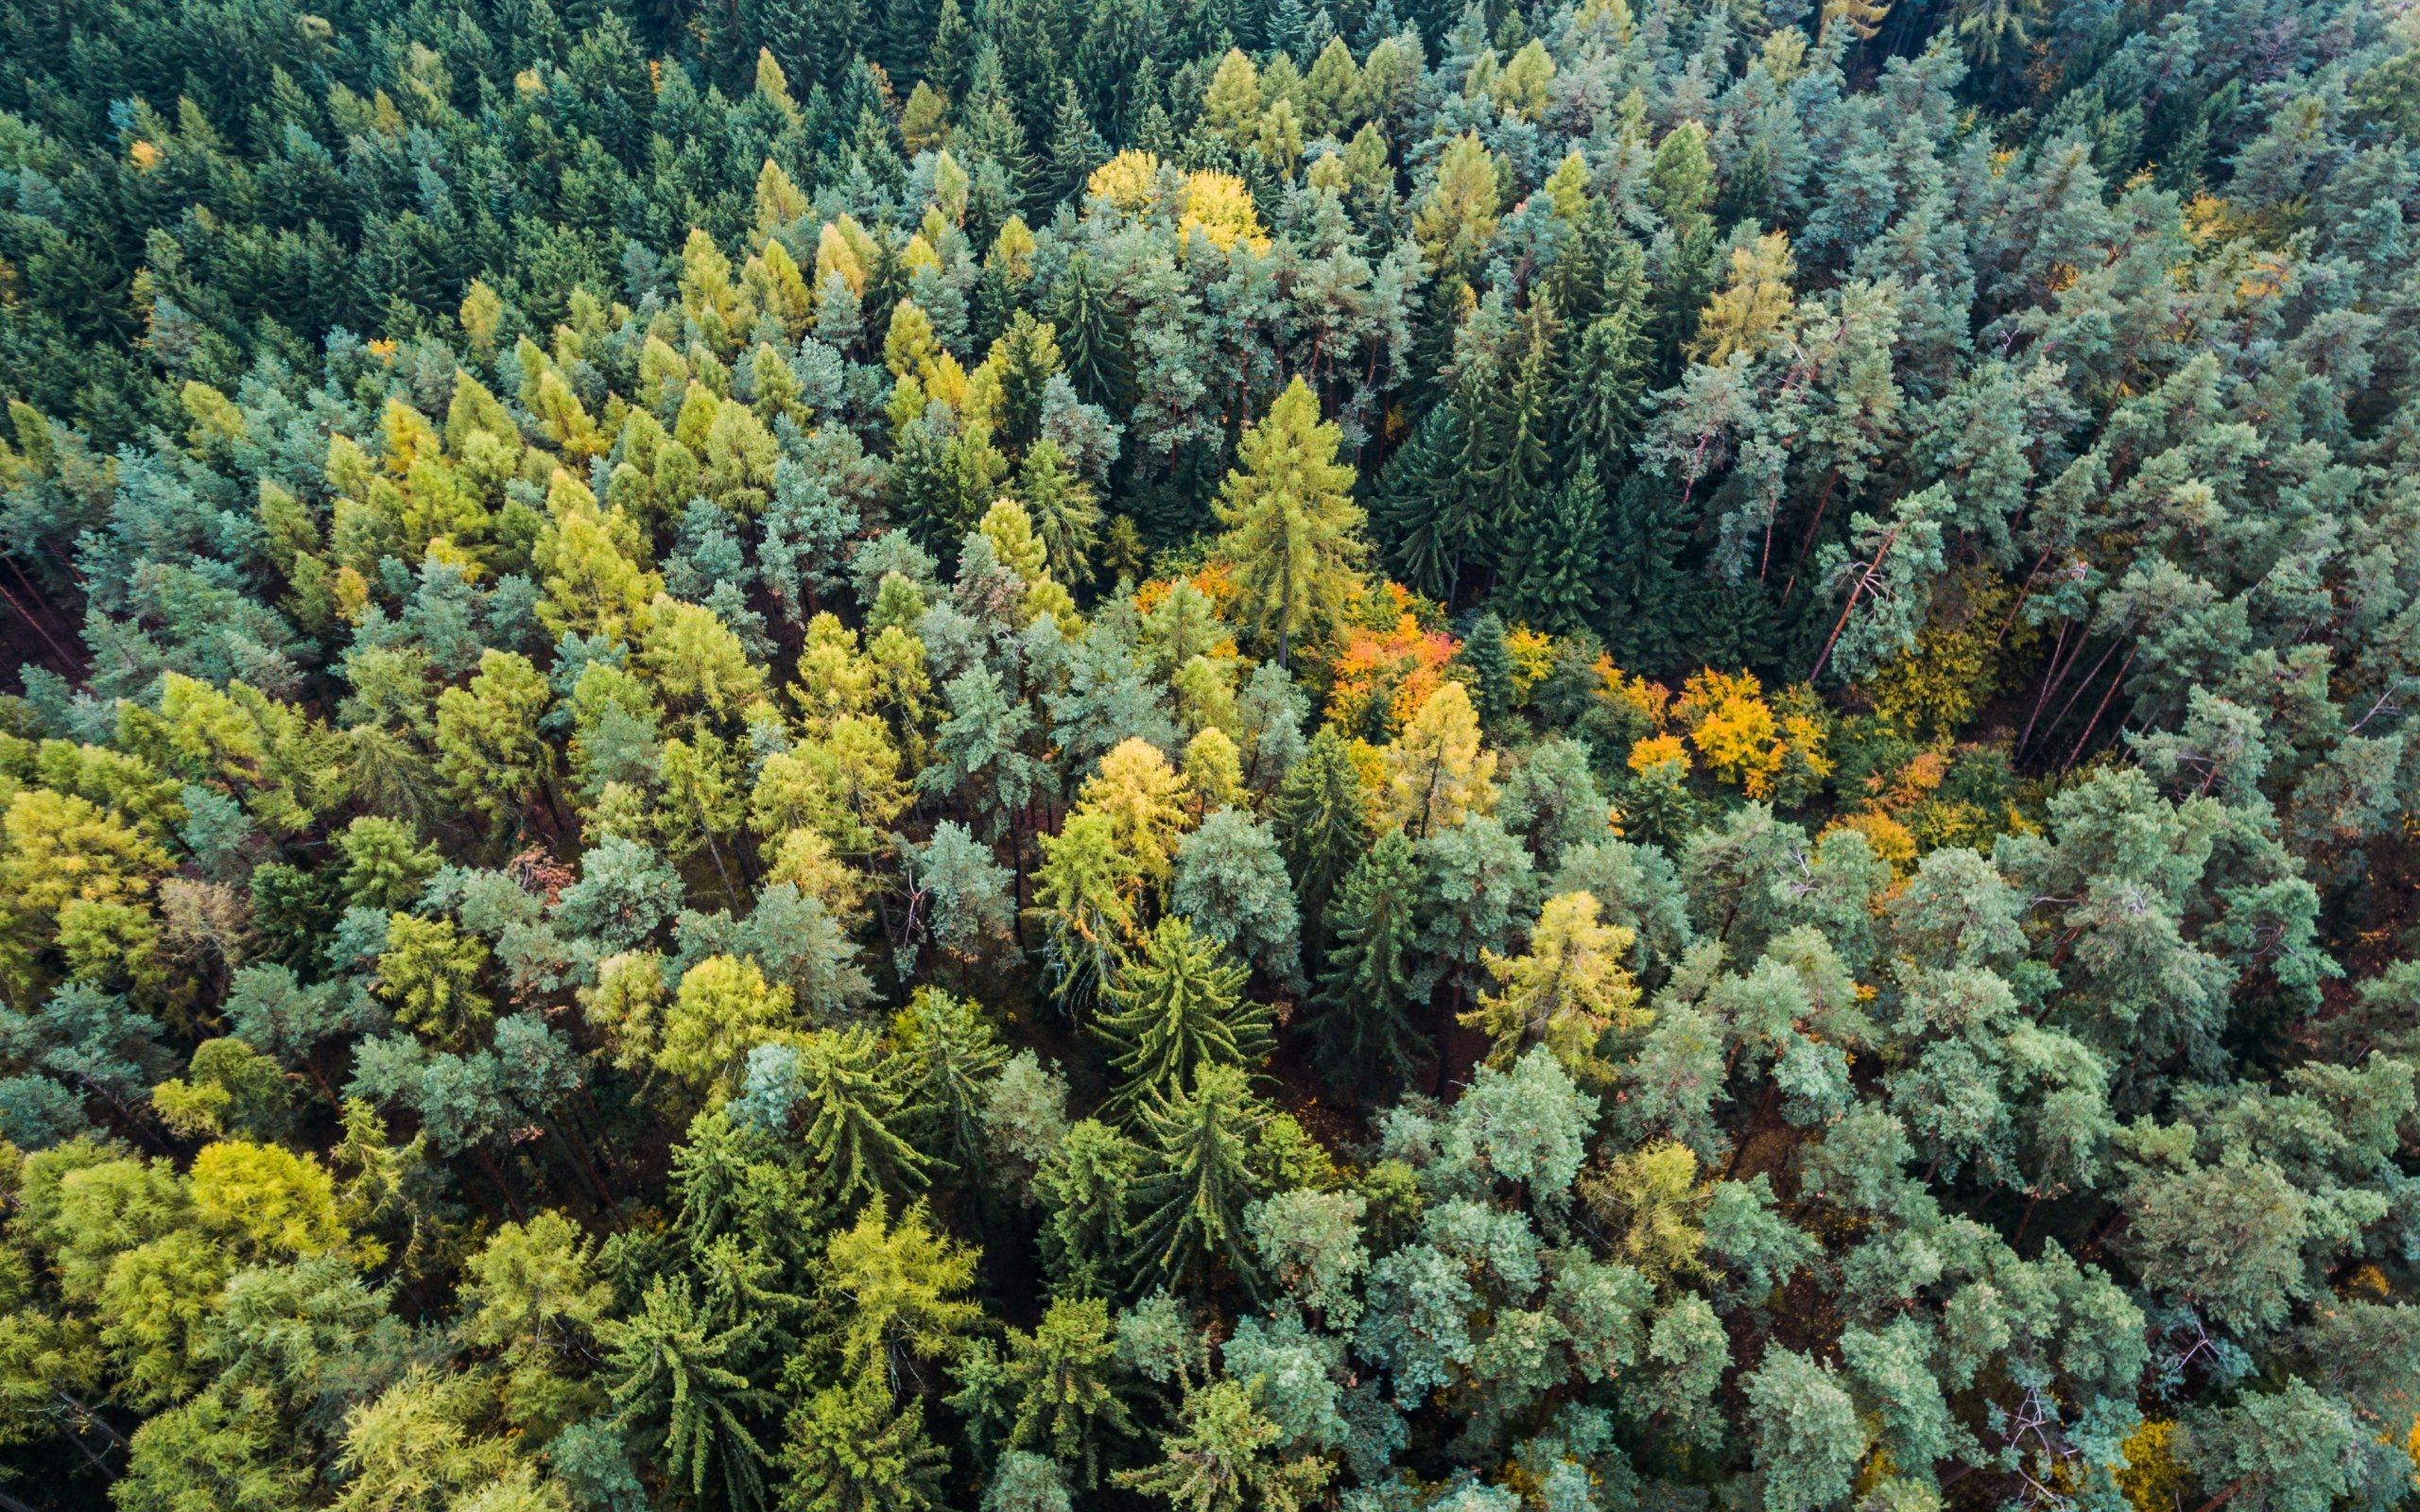 autumn forest wallpaper background